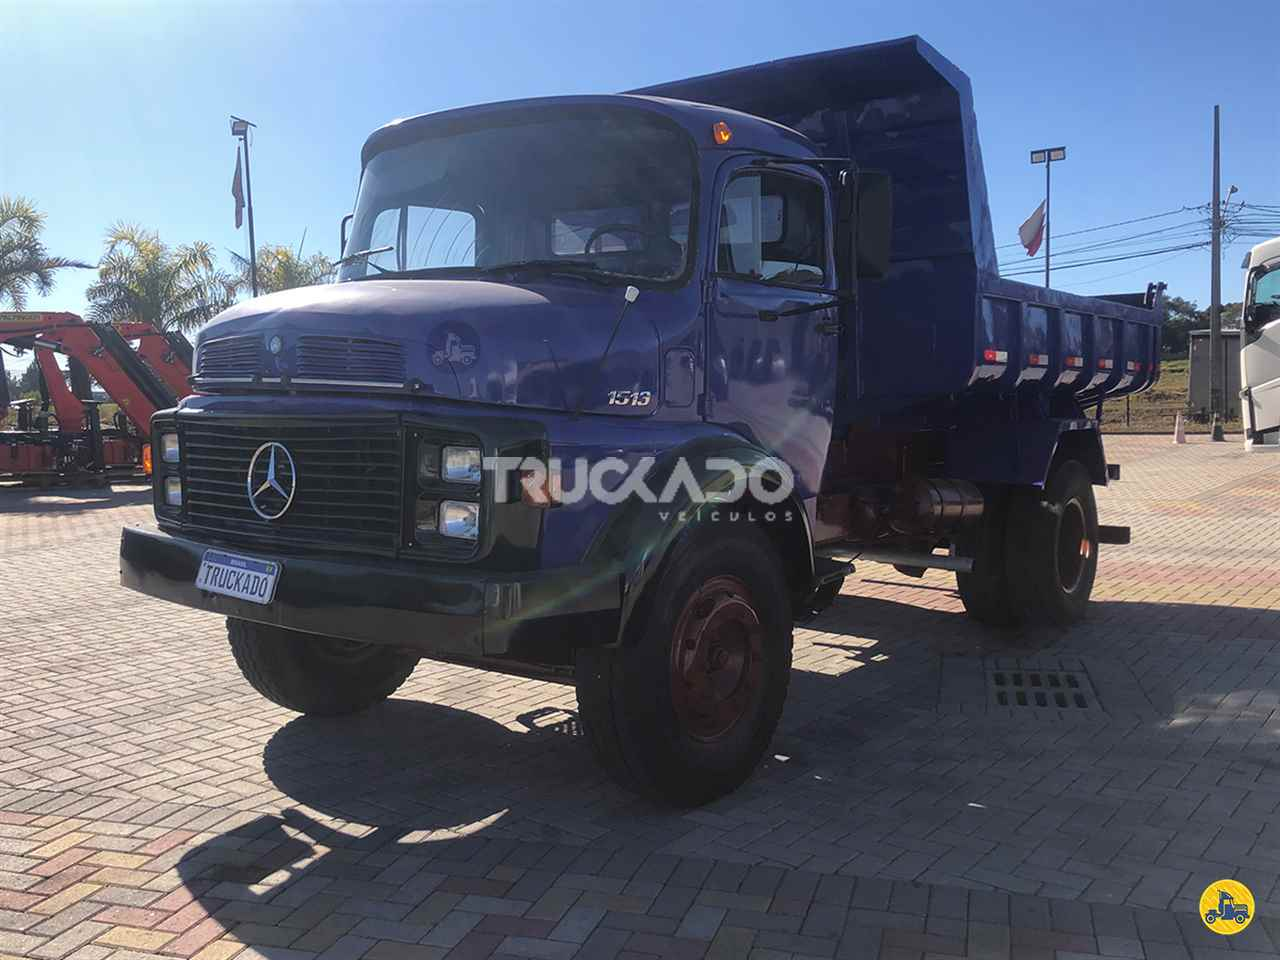 CAMINHAO MERCEDES-BENZ MB 1513 Caçamba Basculante Toco 4x2 Truckado Veículos SINOP MATO GROSSO MT